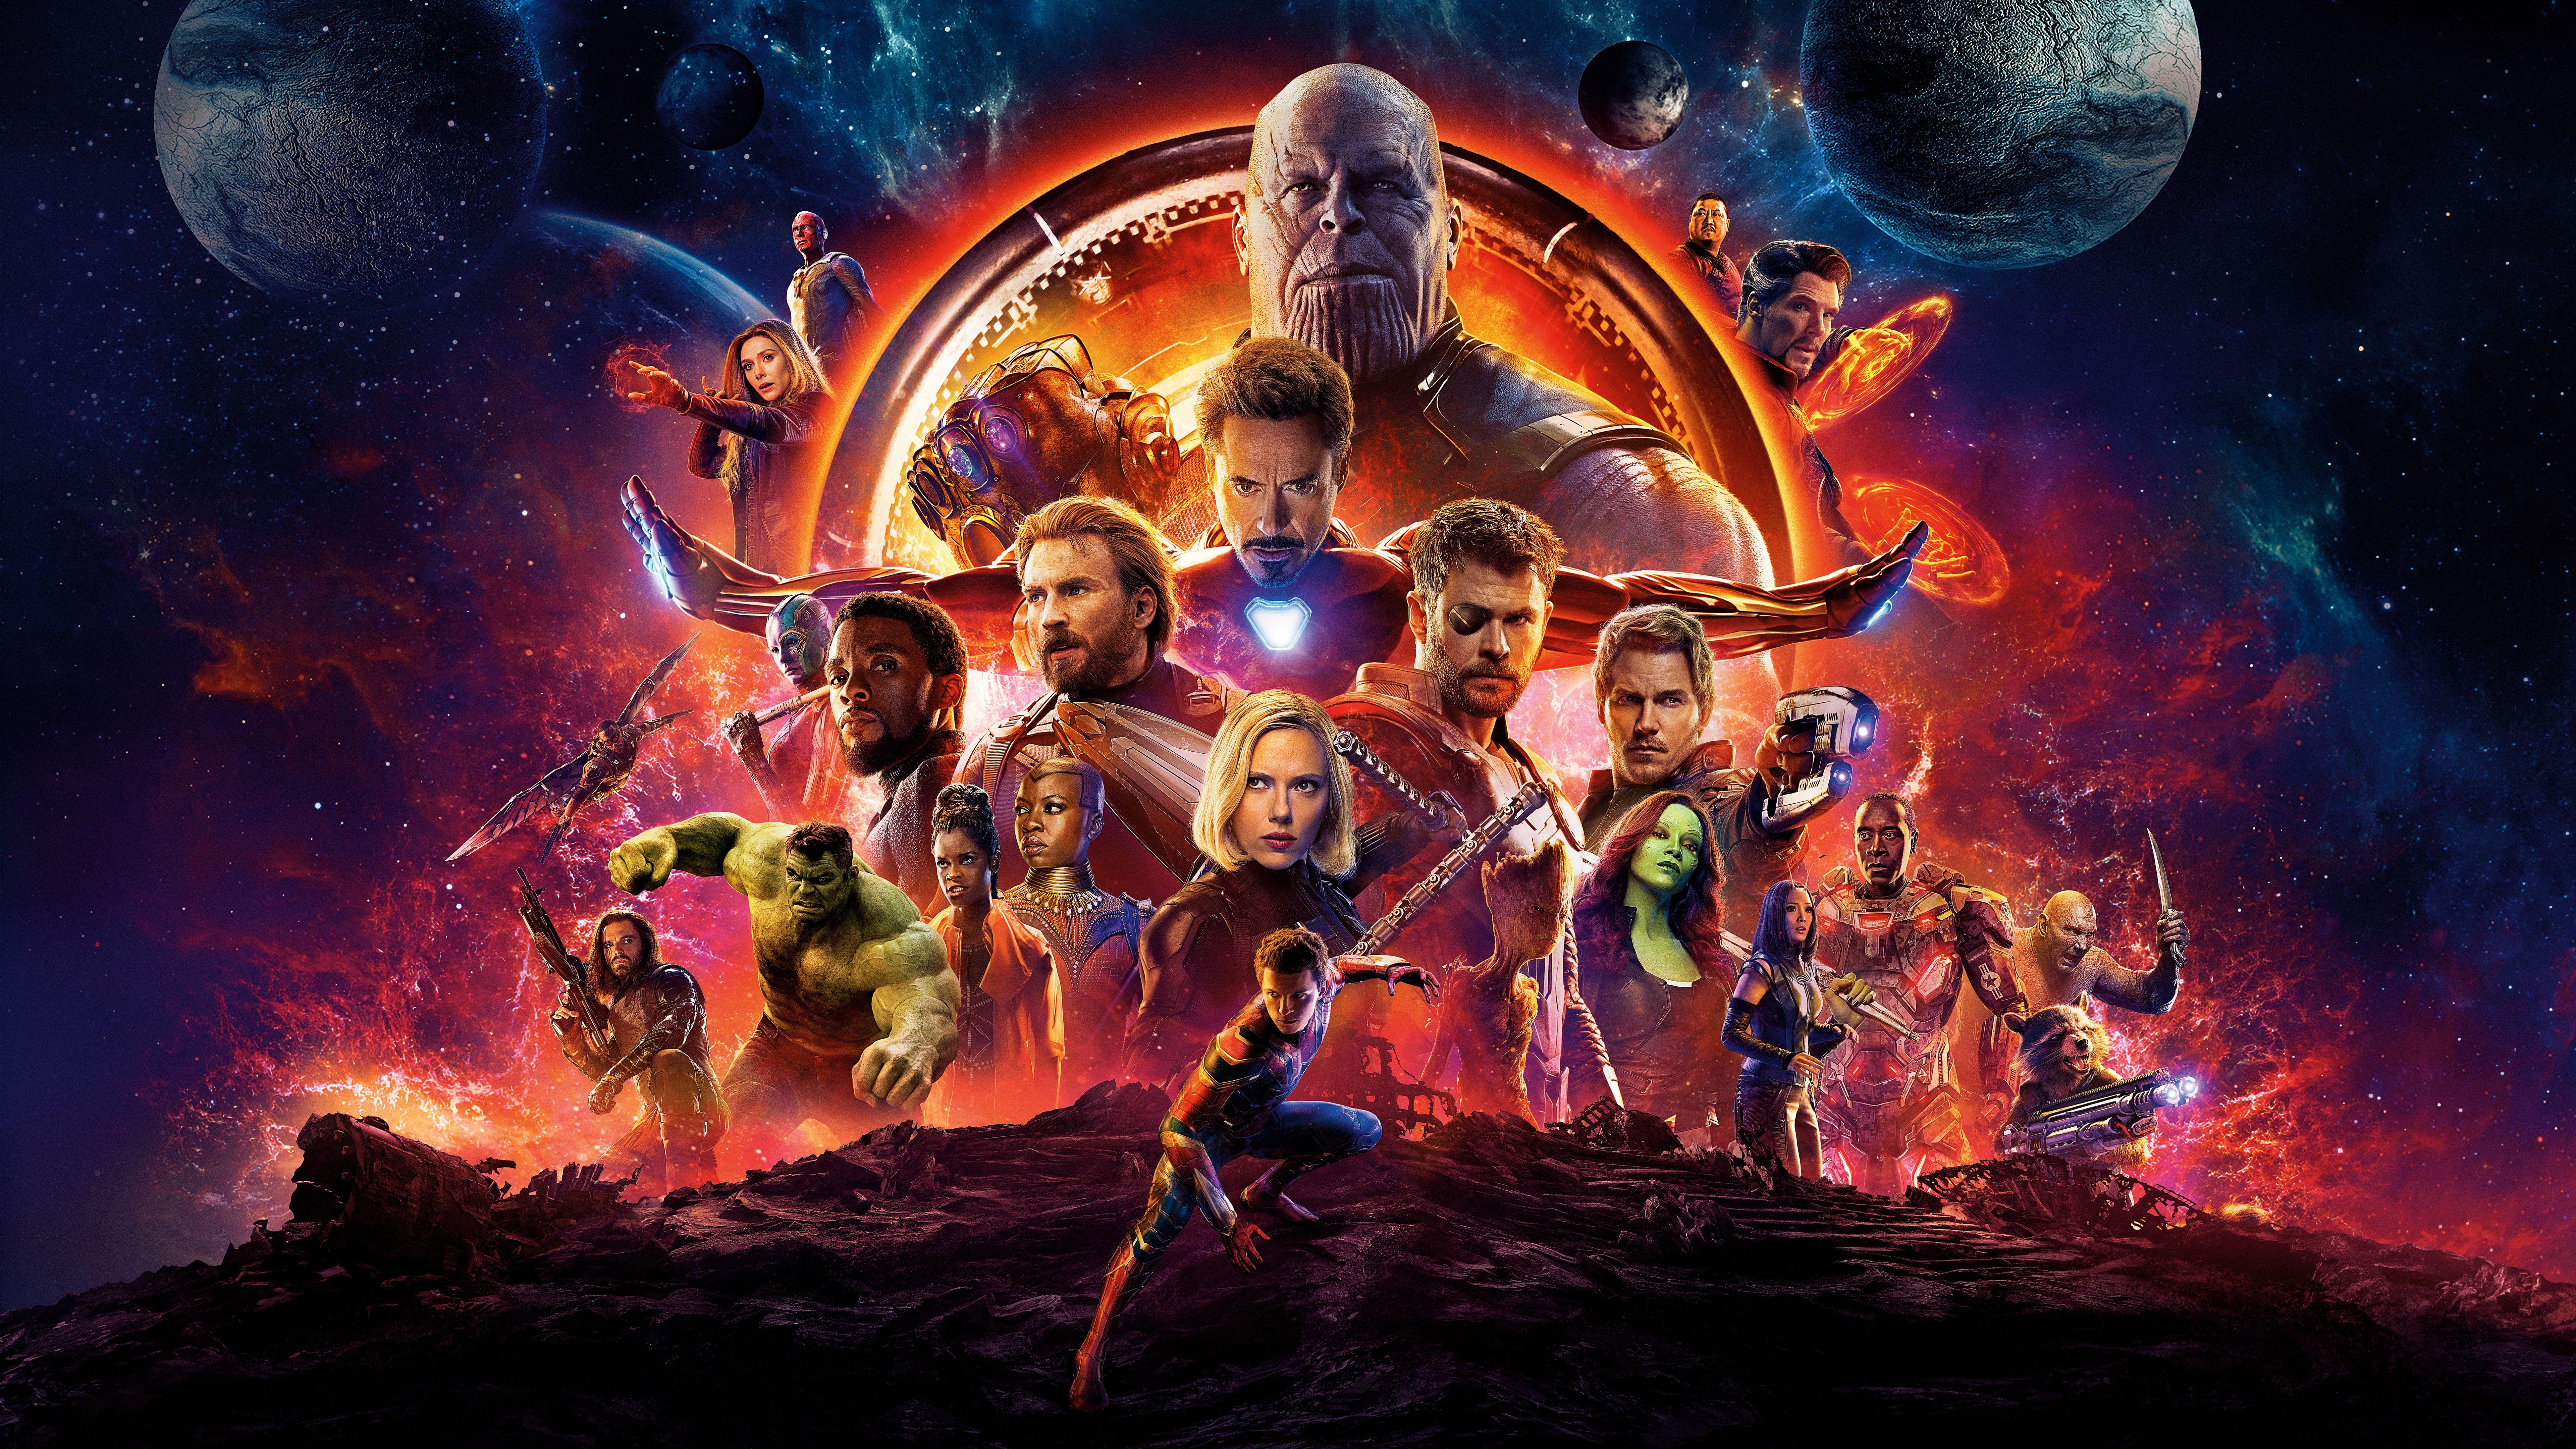 Avengers Characters Infinity War Marvel Cinematic Avengers Wallpaper Marvel Cinematic Universe